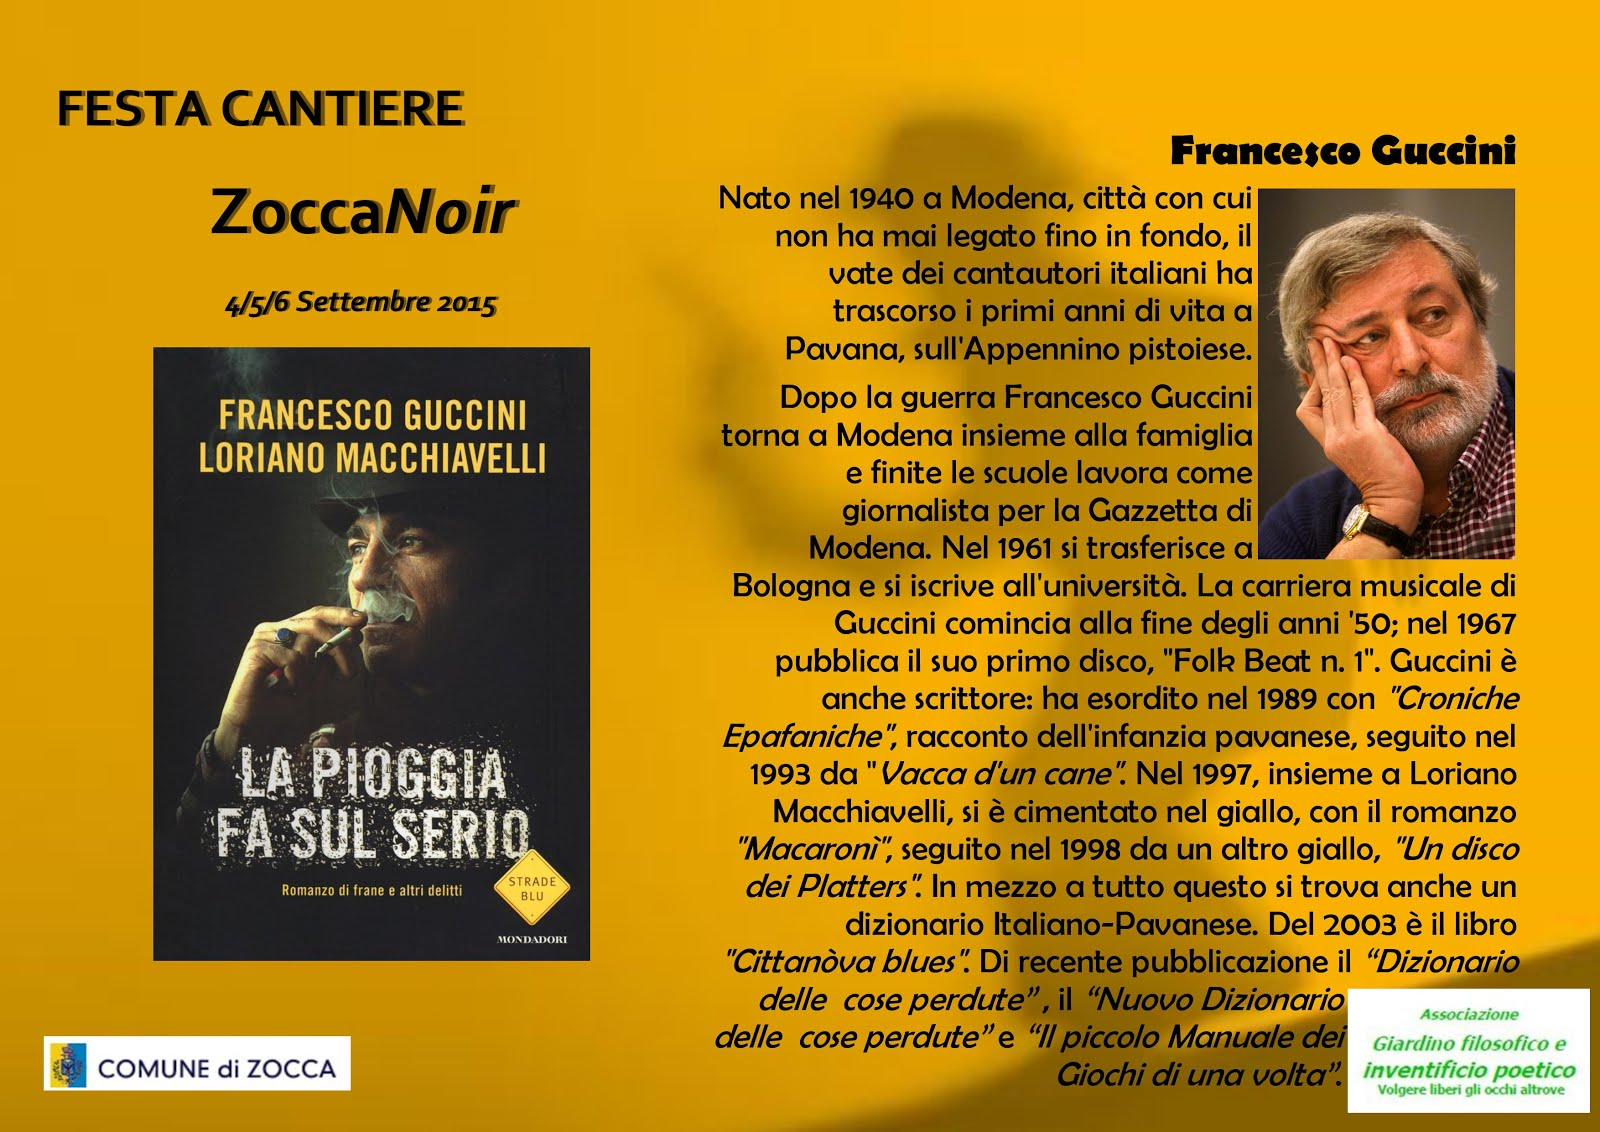 Biografia Francesco Guccini